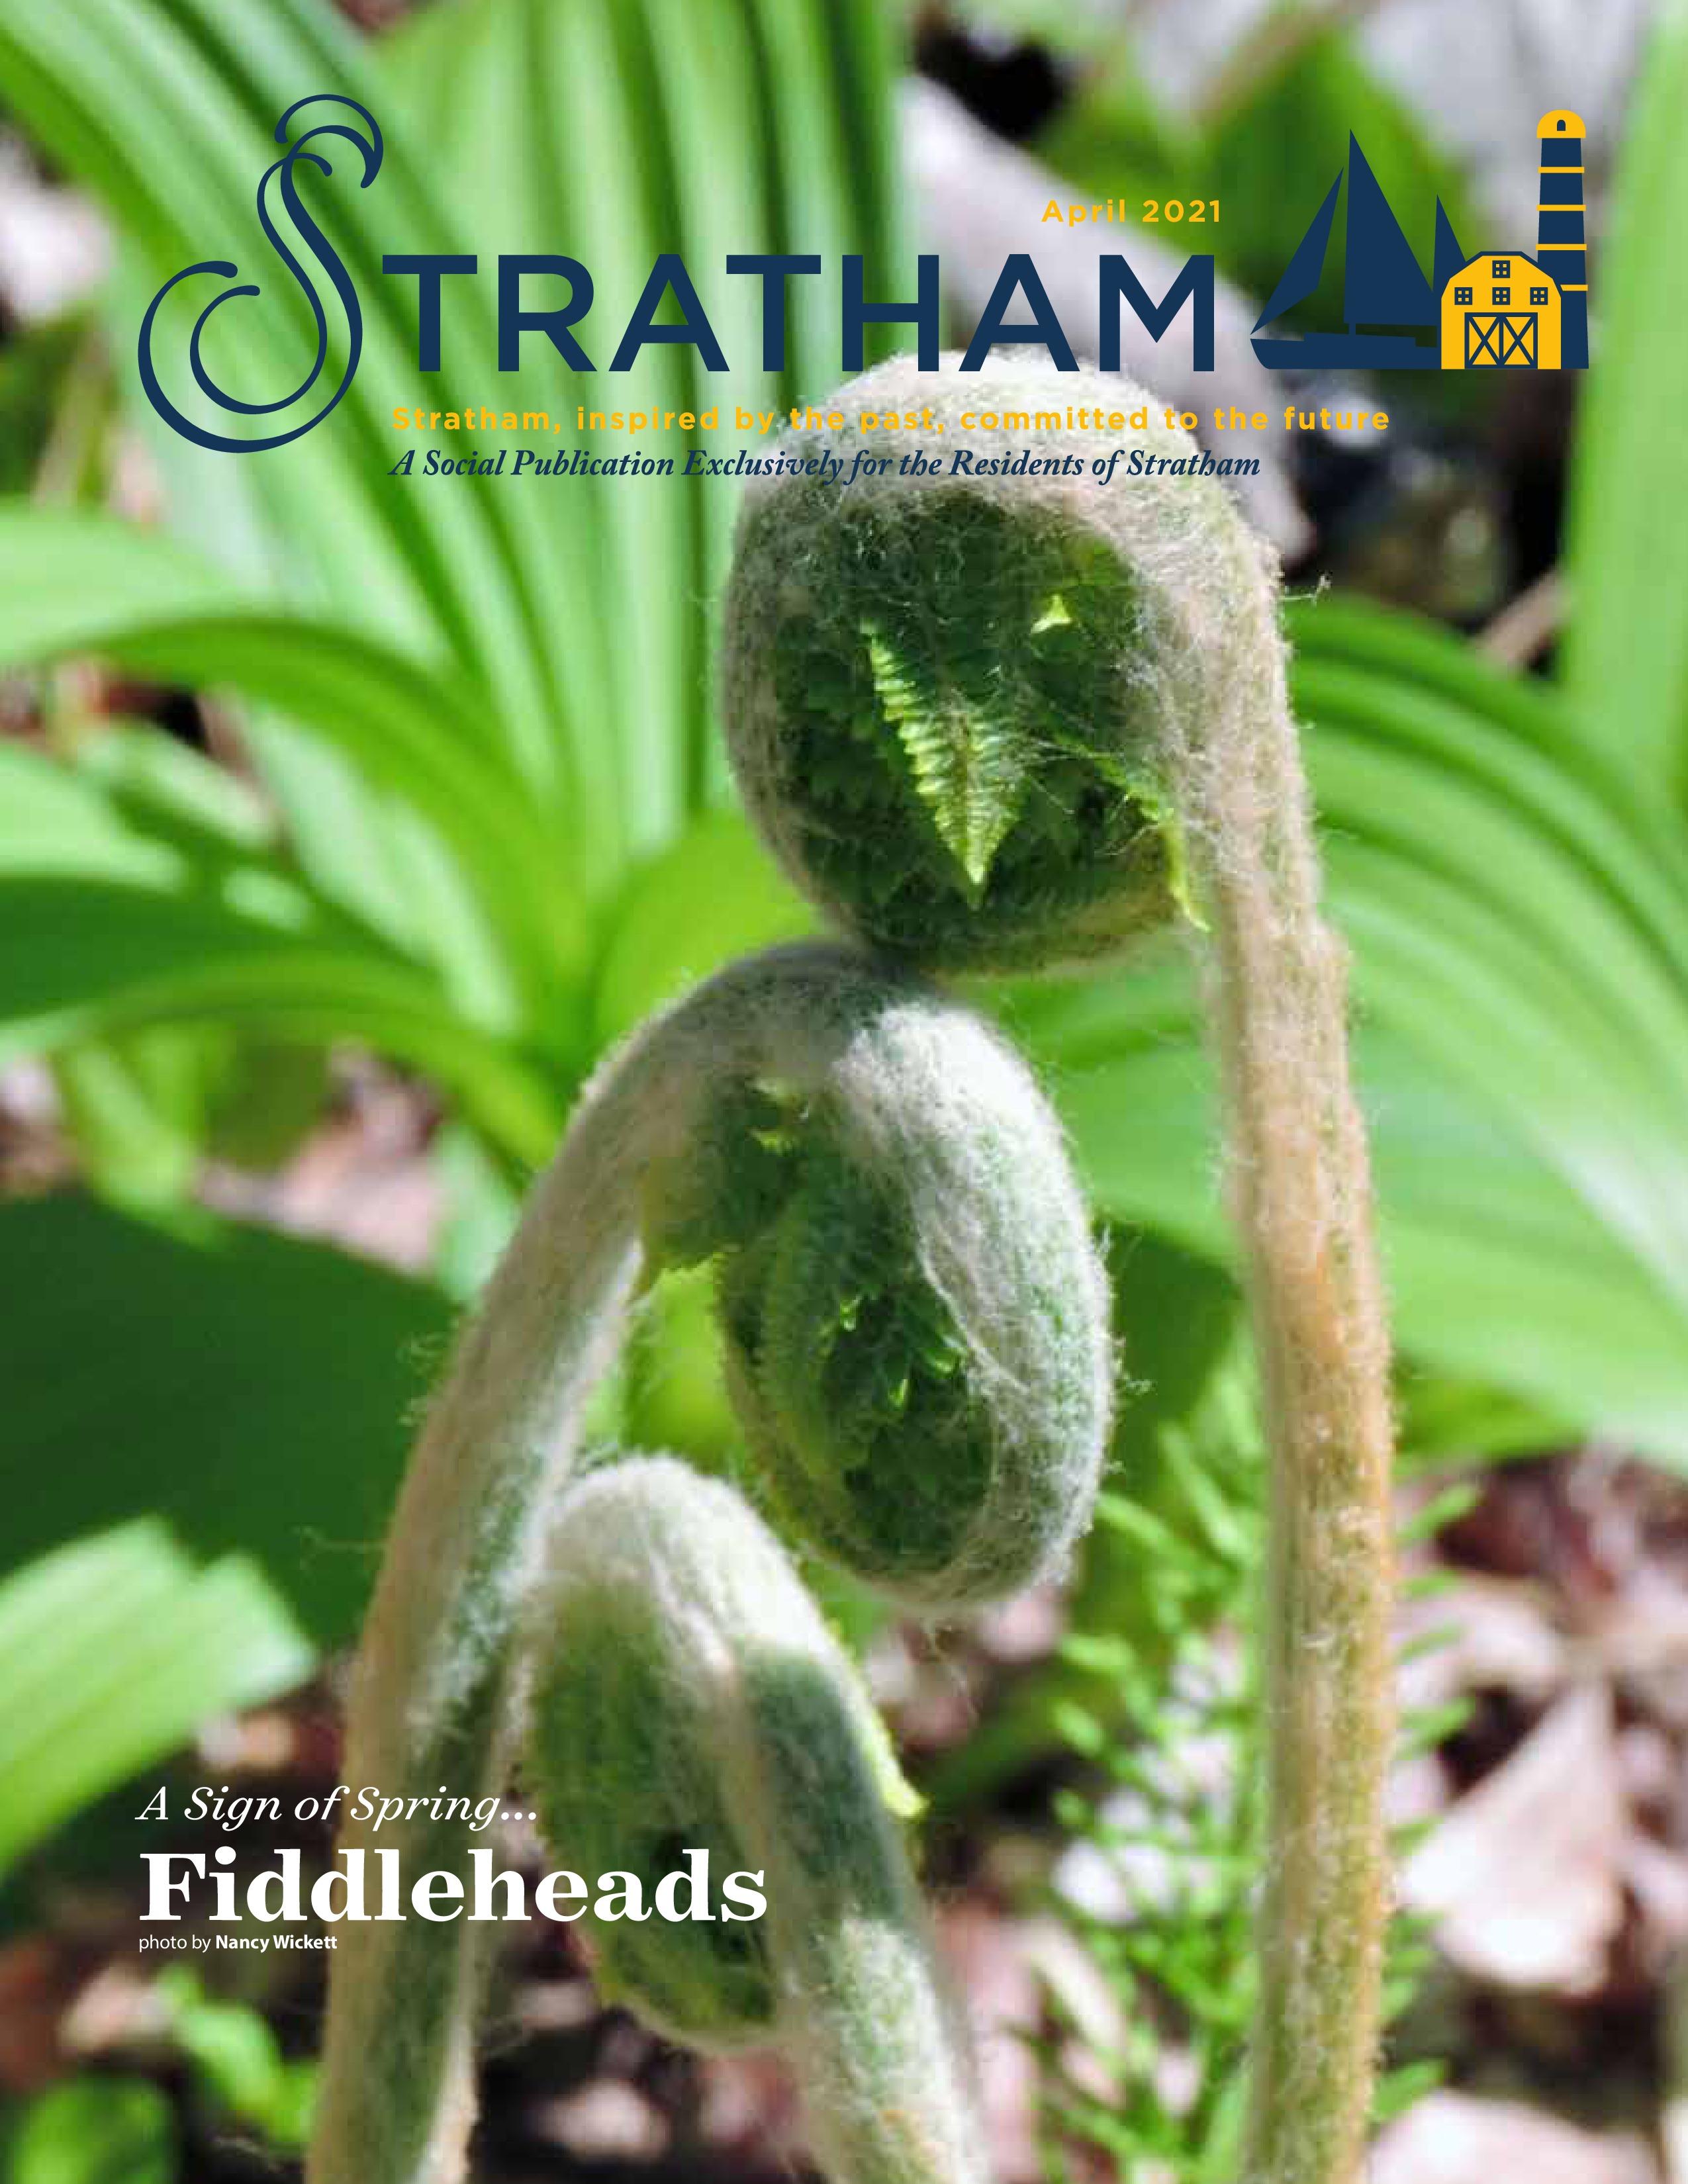 Stratham 2021-04-01